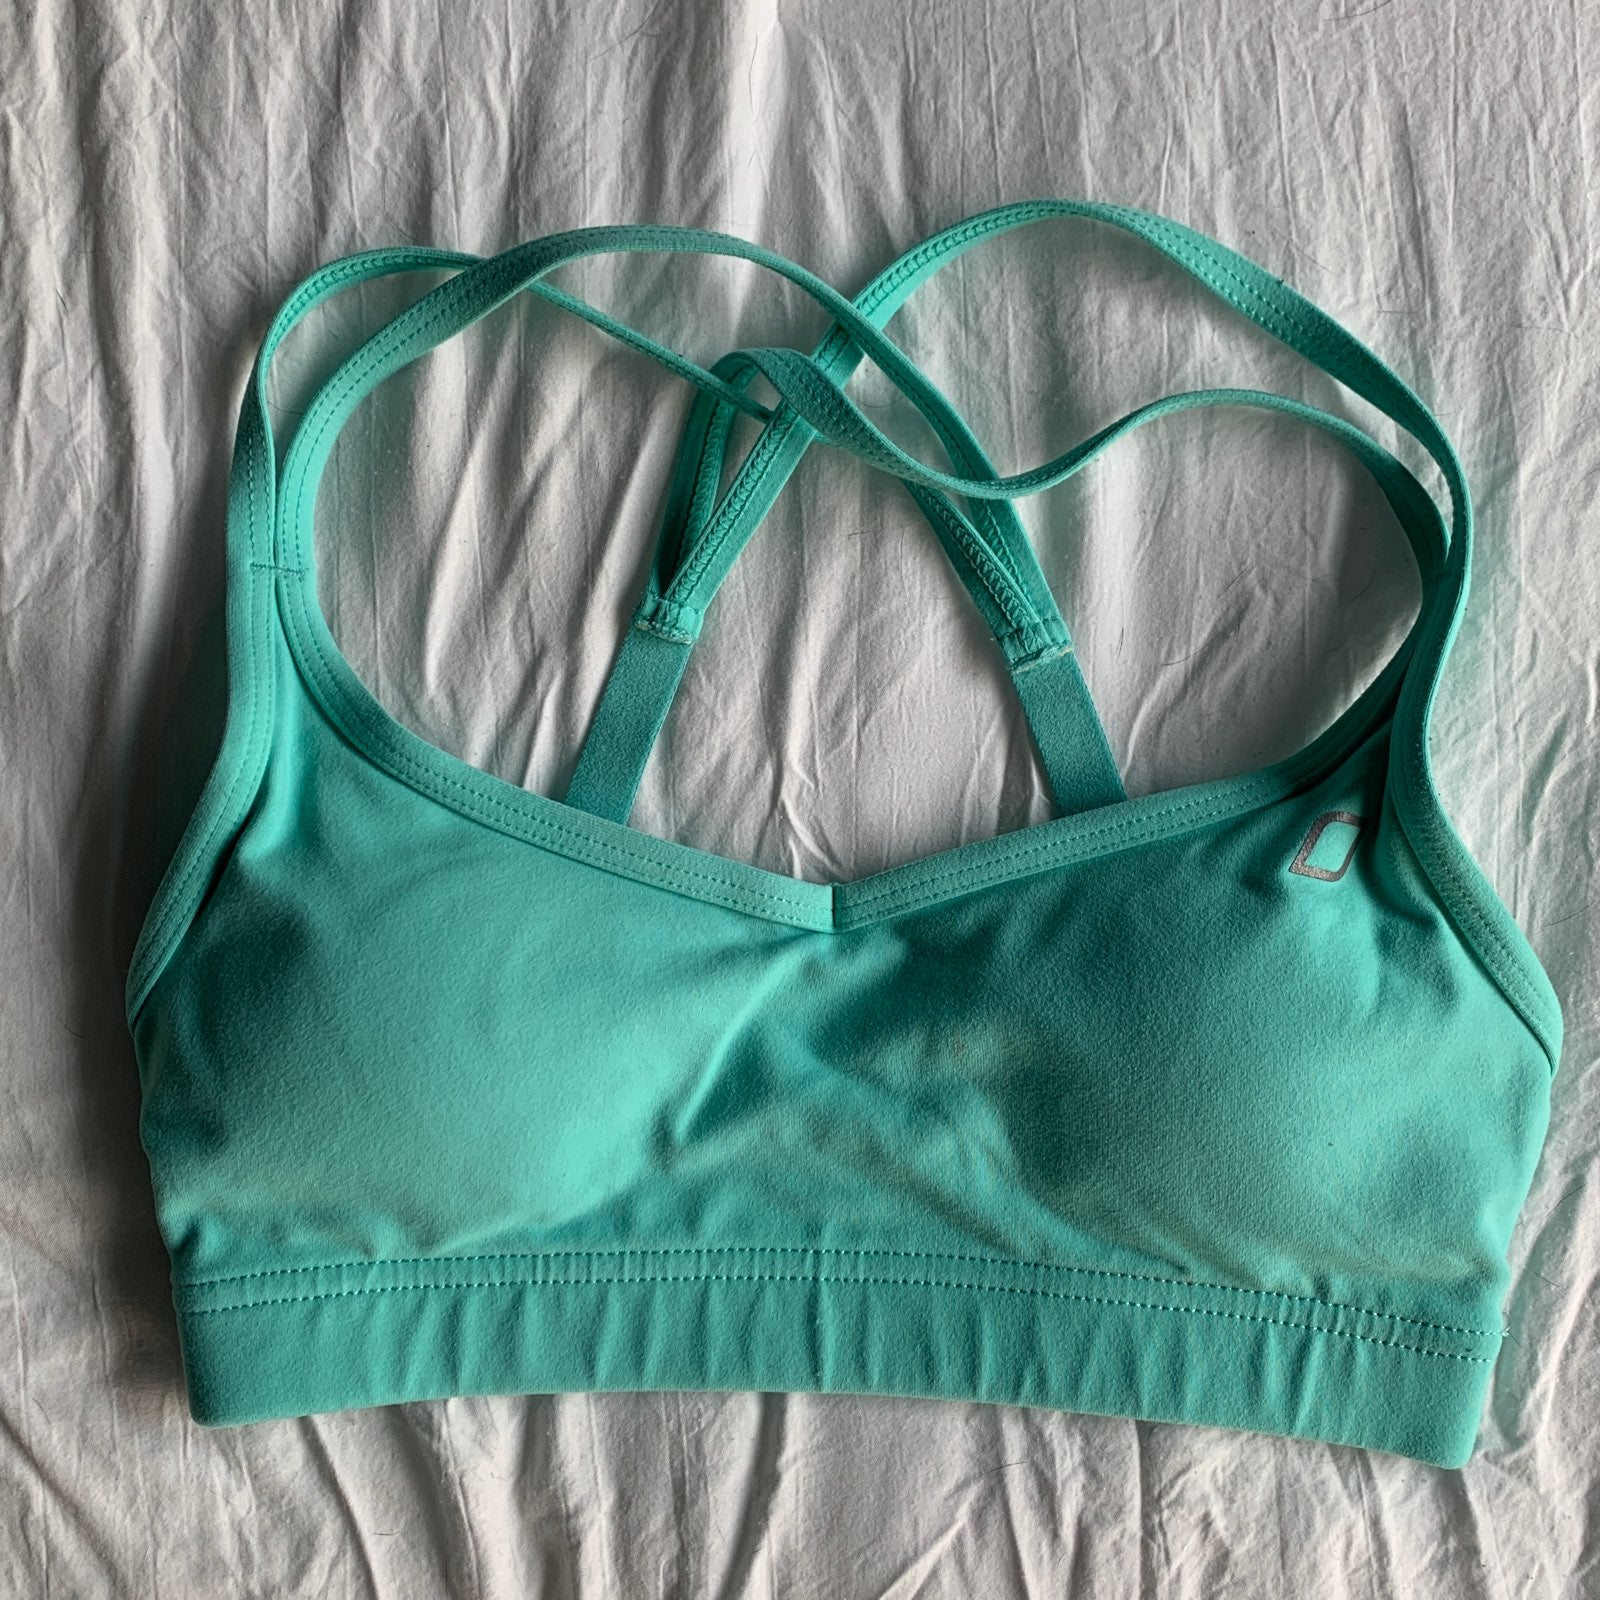 Turquoise Lorna Jane Sports Bra